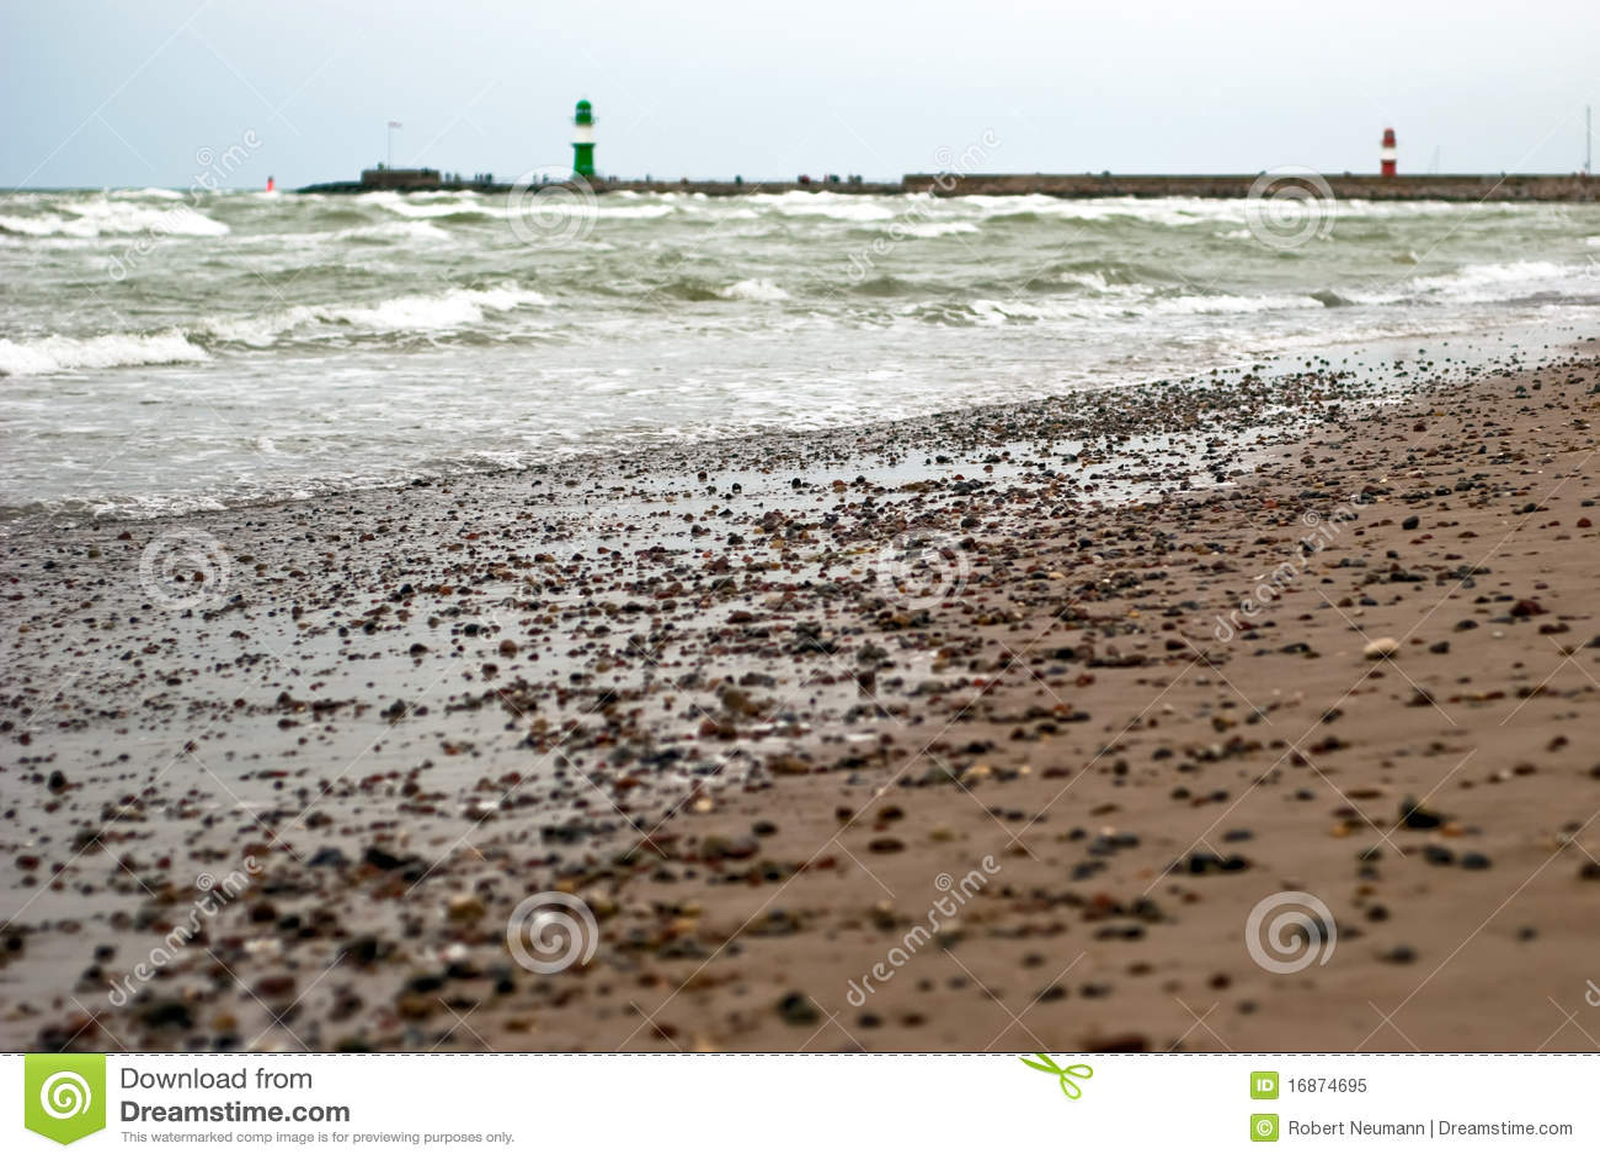 Praia na frente dos faróis